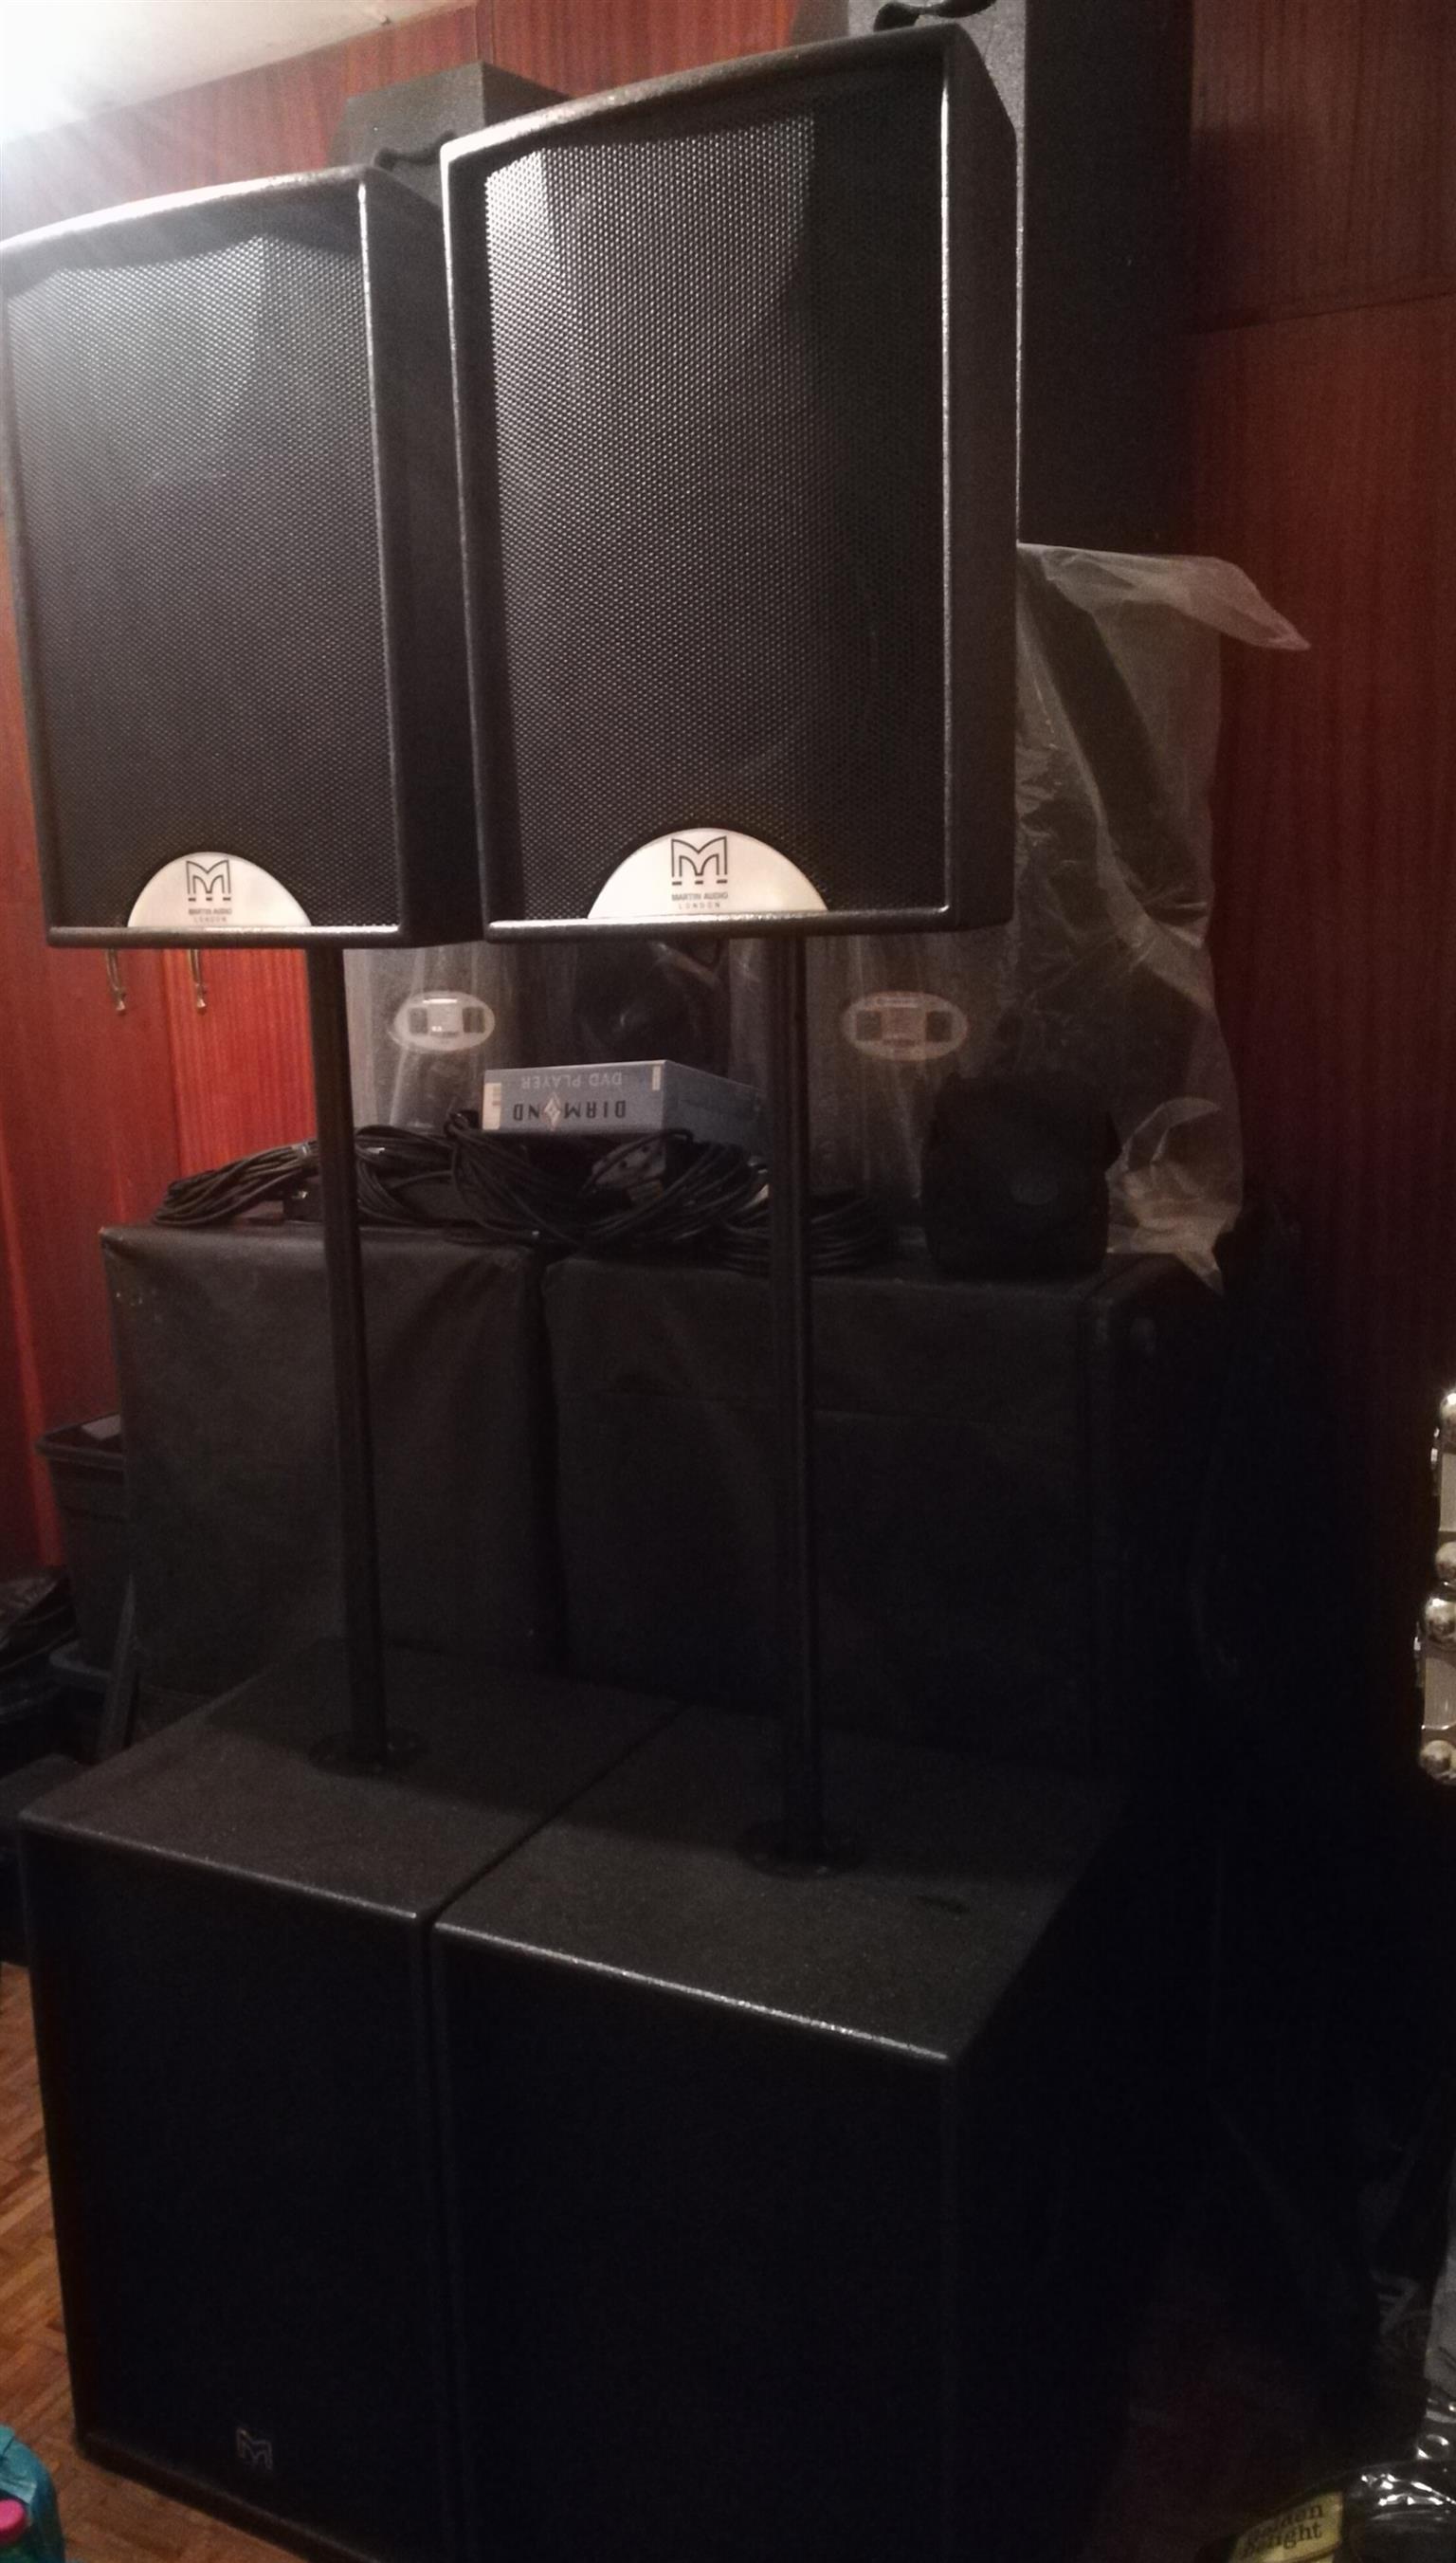 Martin audio Sound system